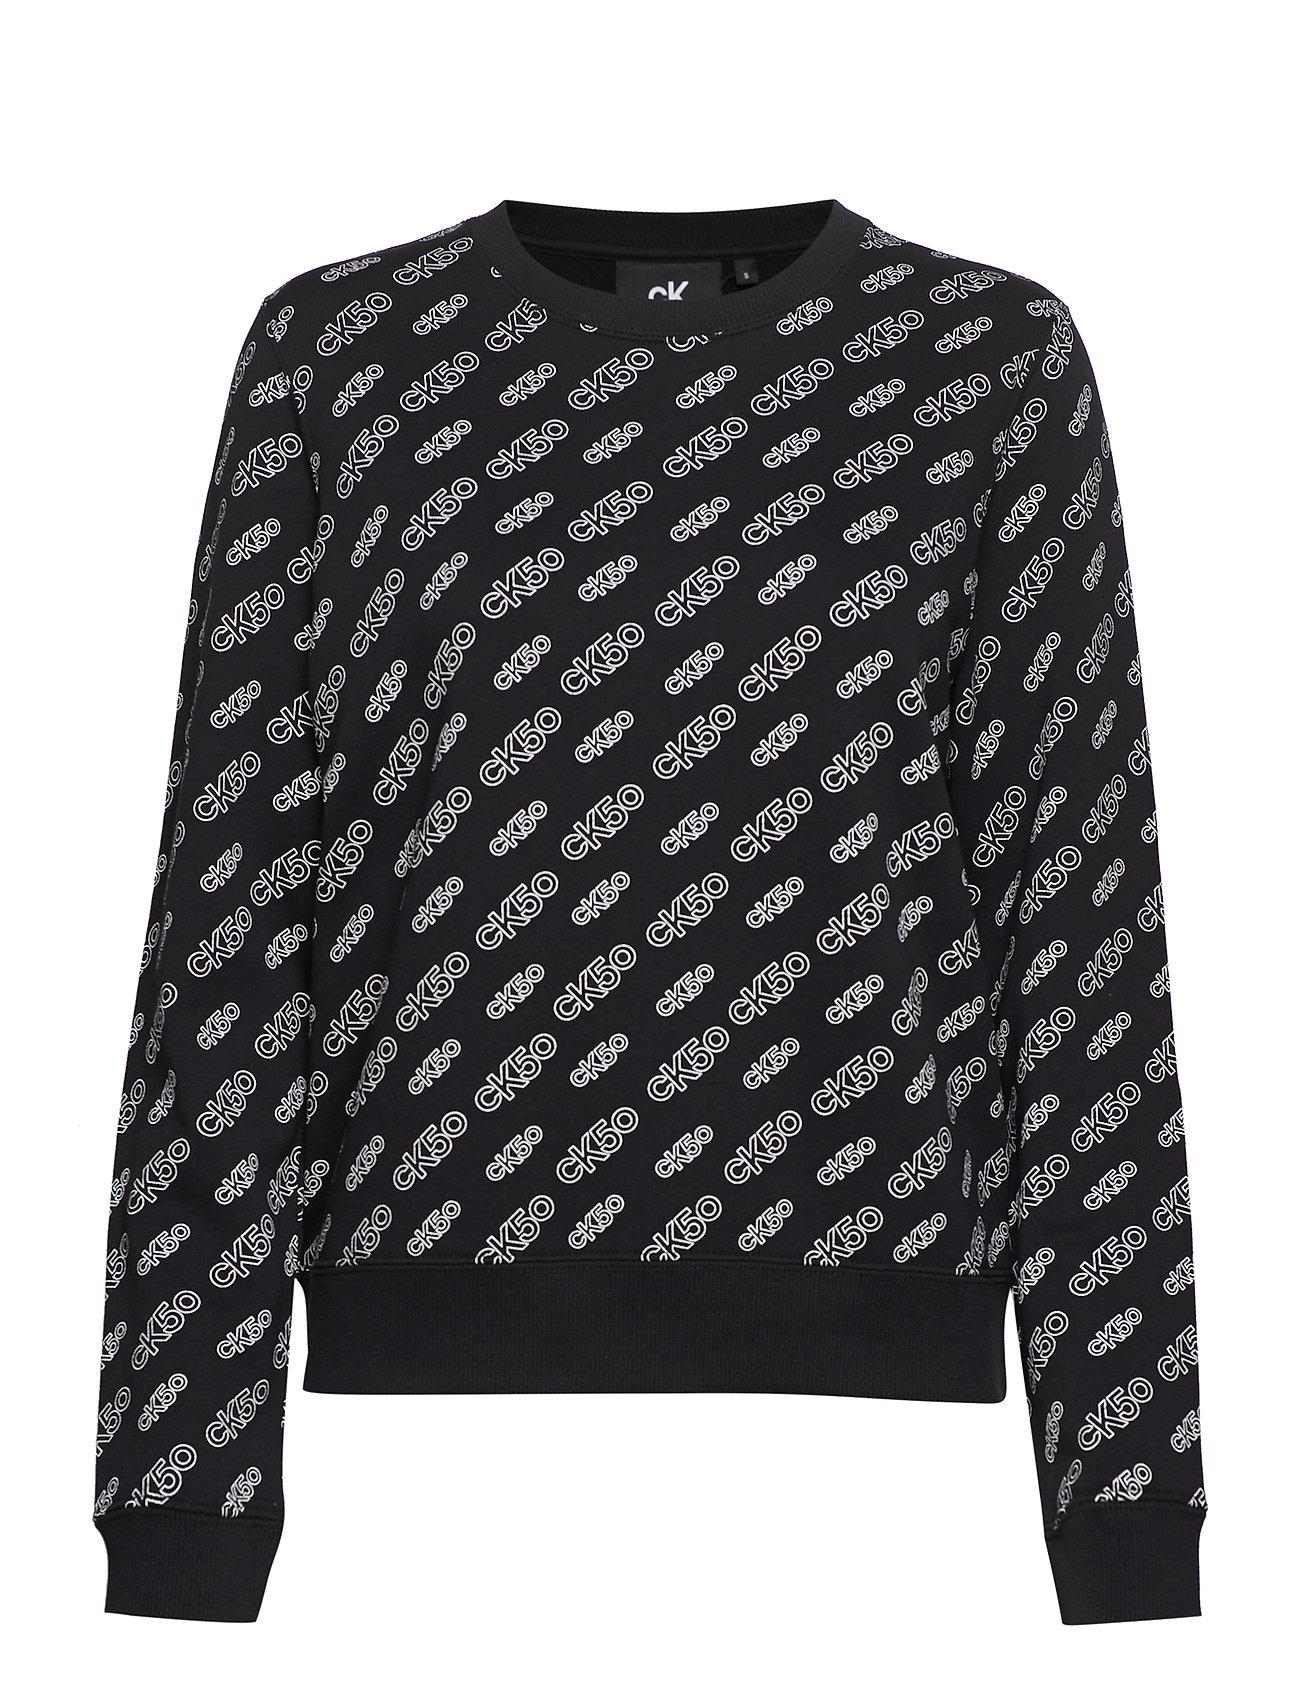 Calvin Klein Jeans AOP CN REGULAR HWK - CK50 AOP BLACK/ WHITE LOGO